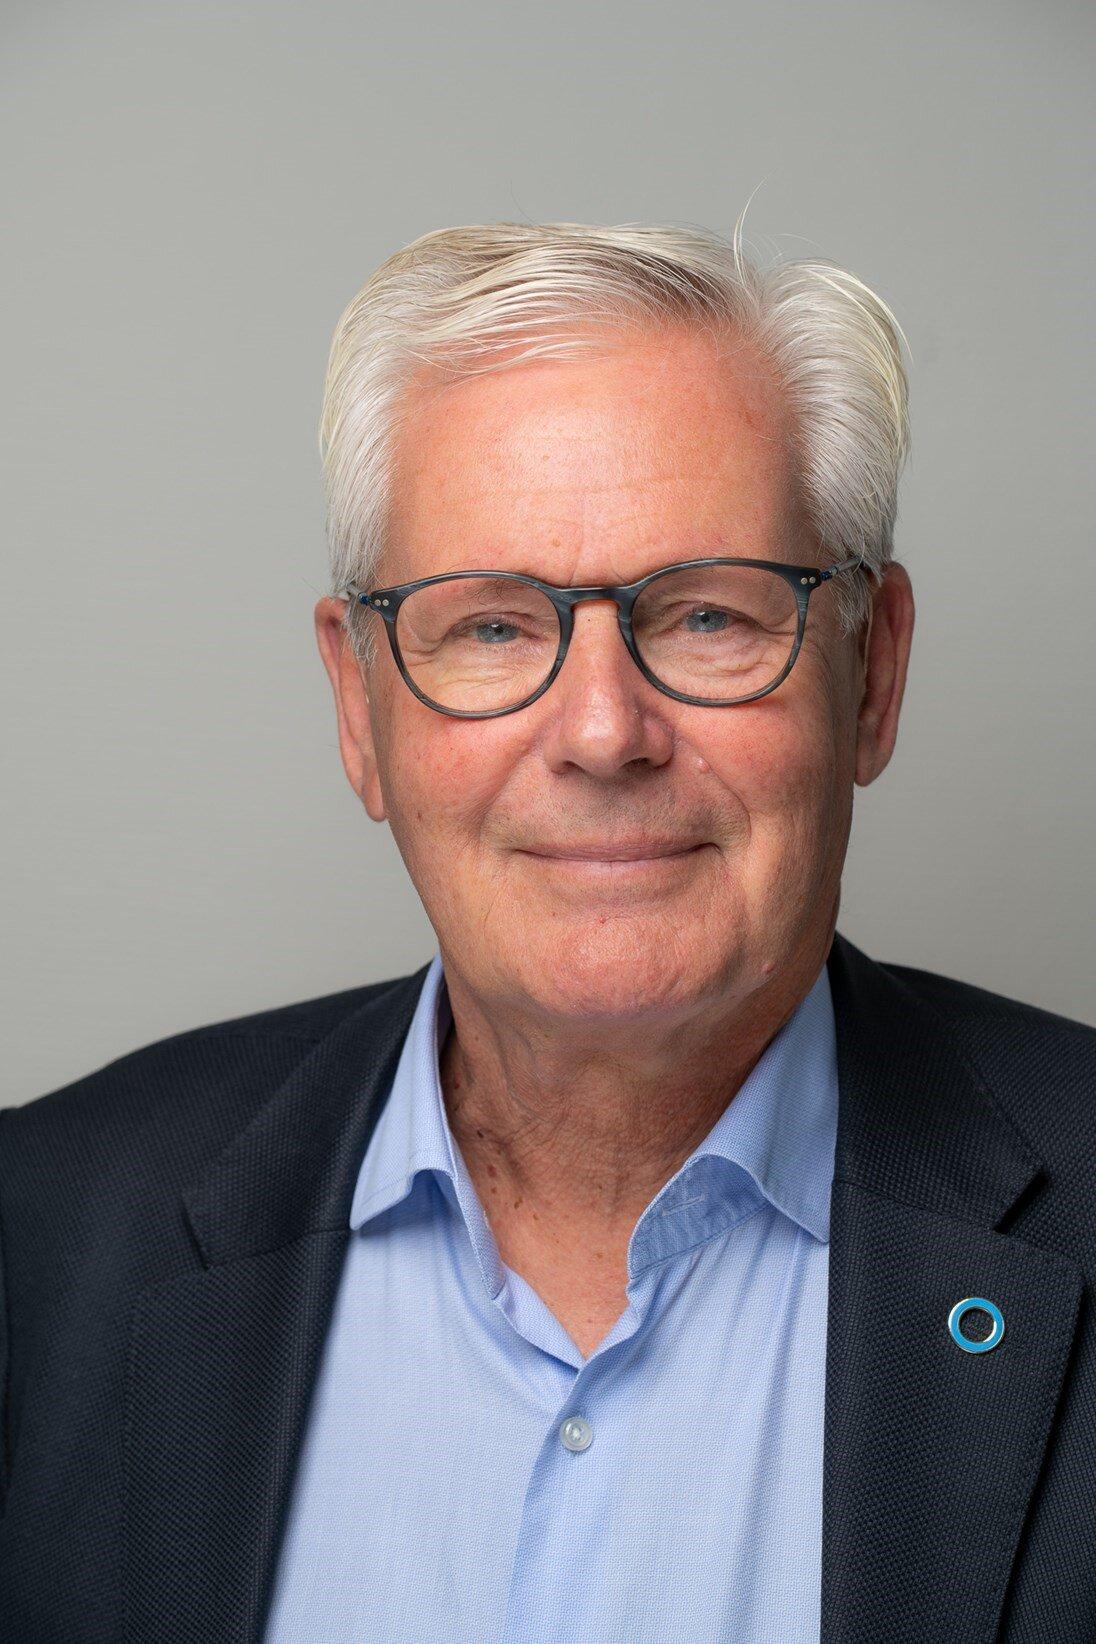 Knut Dahl-Jørgensen